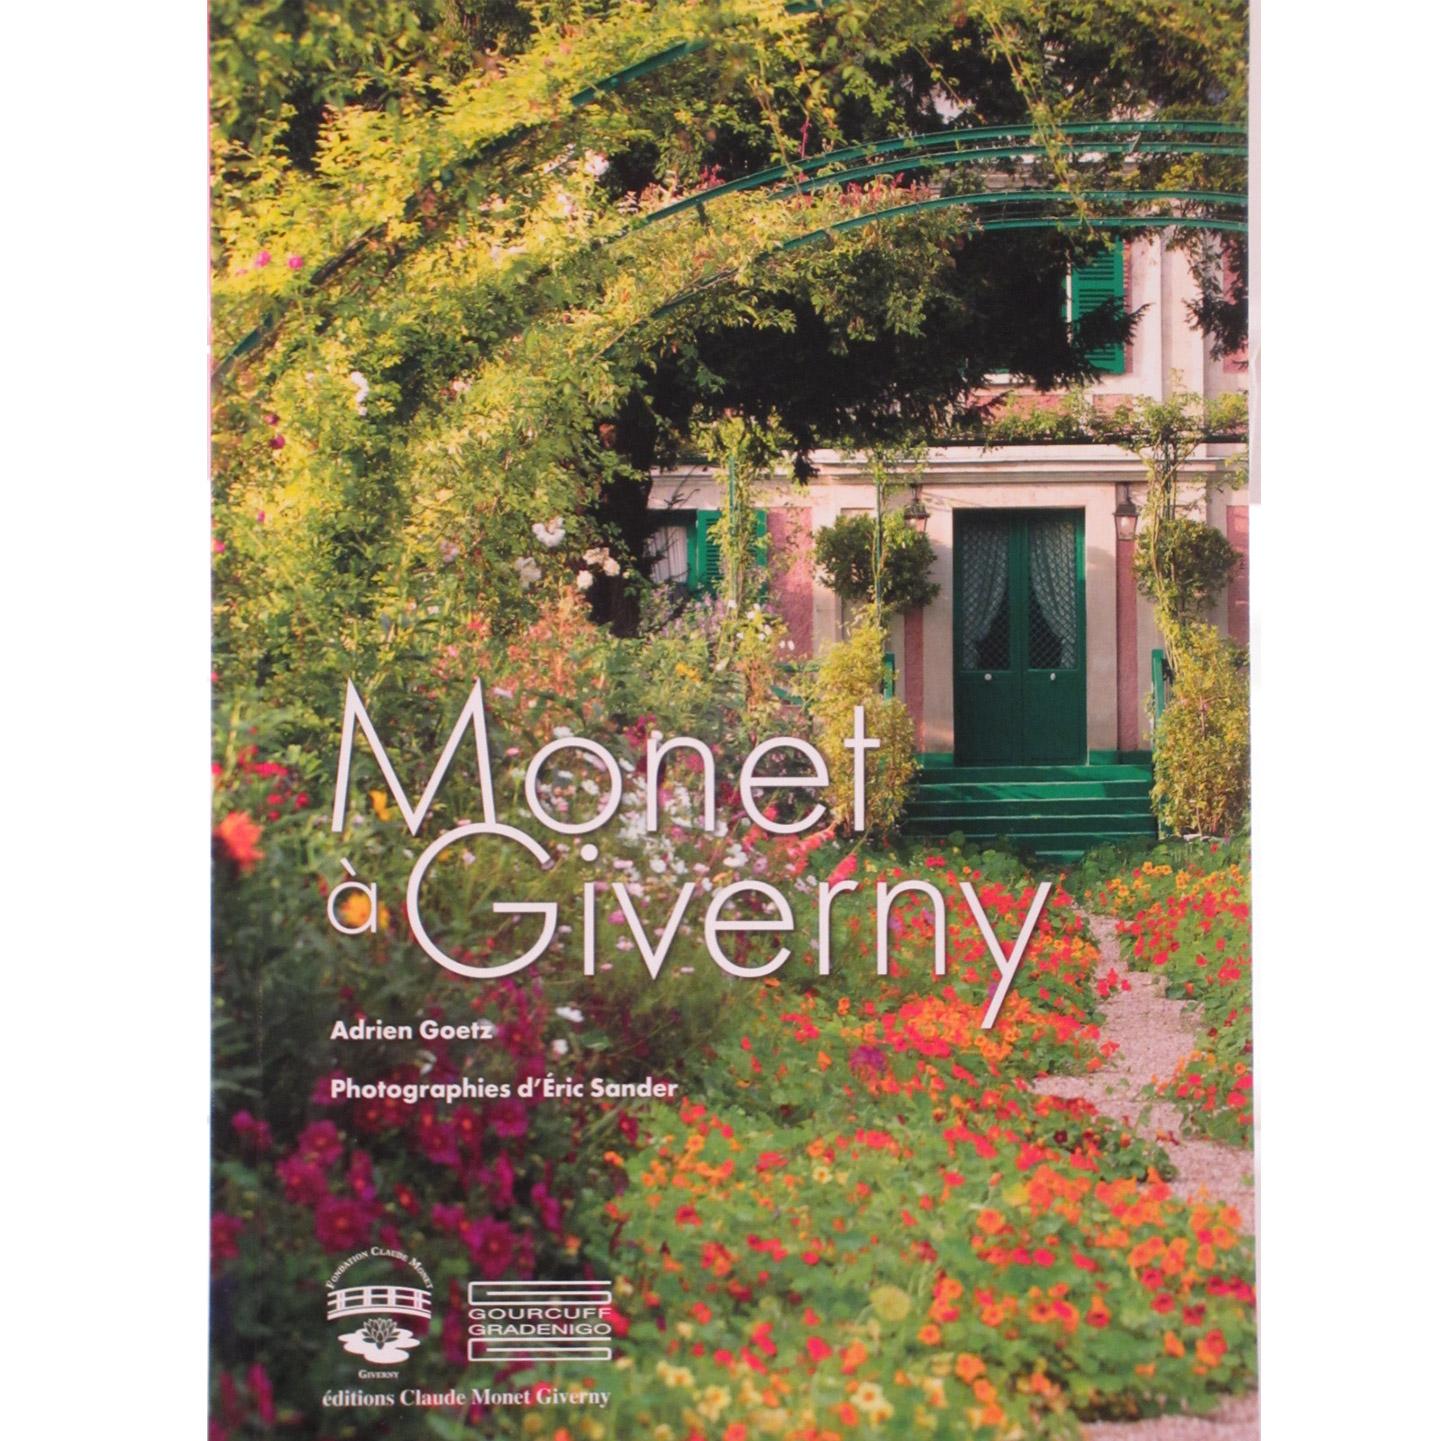 fondation claude monet Monet at Giverny fondation claude monet